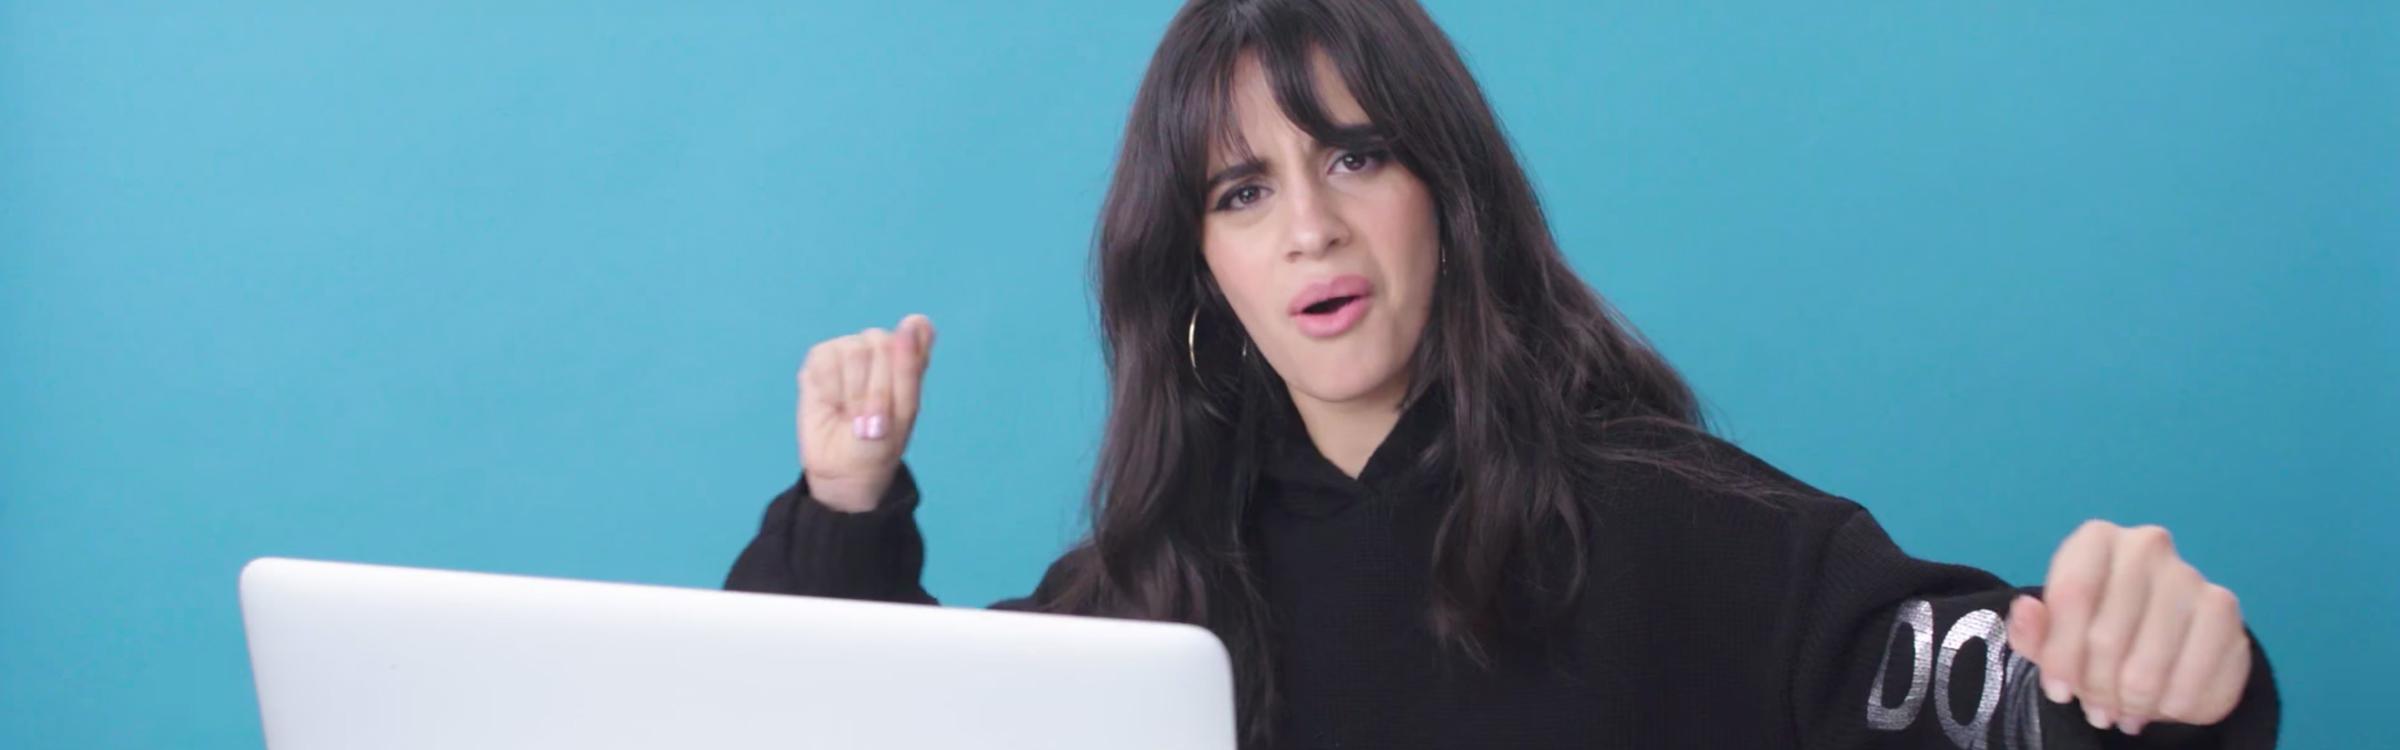 Camila header